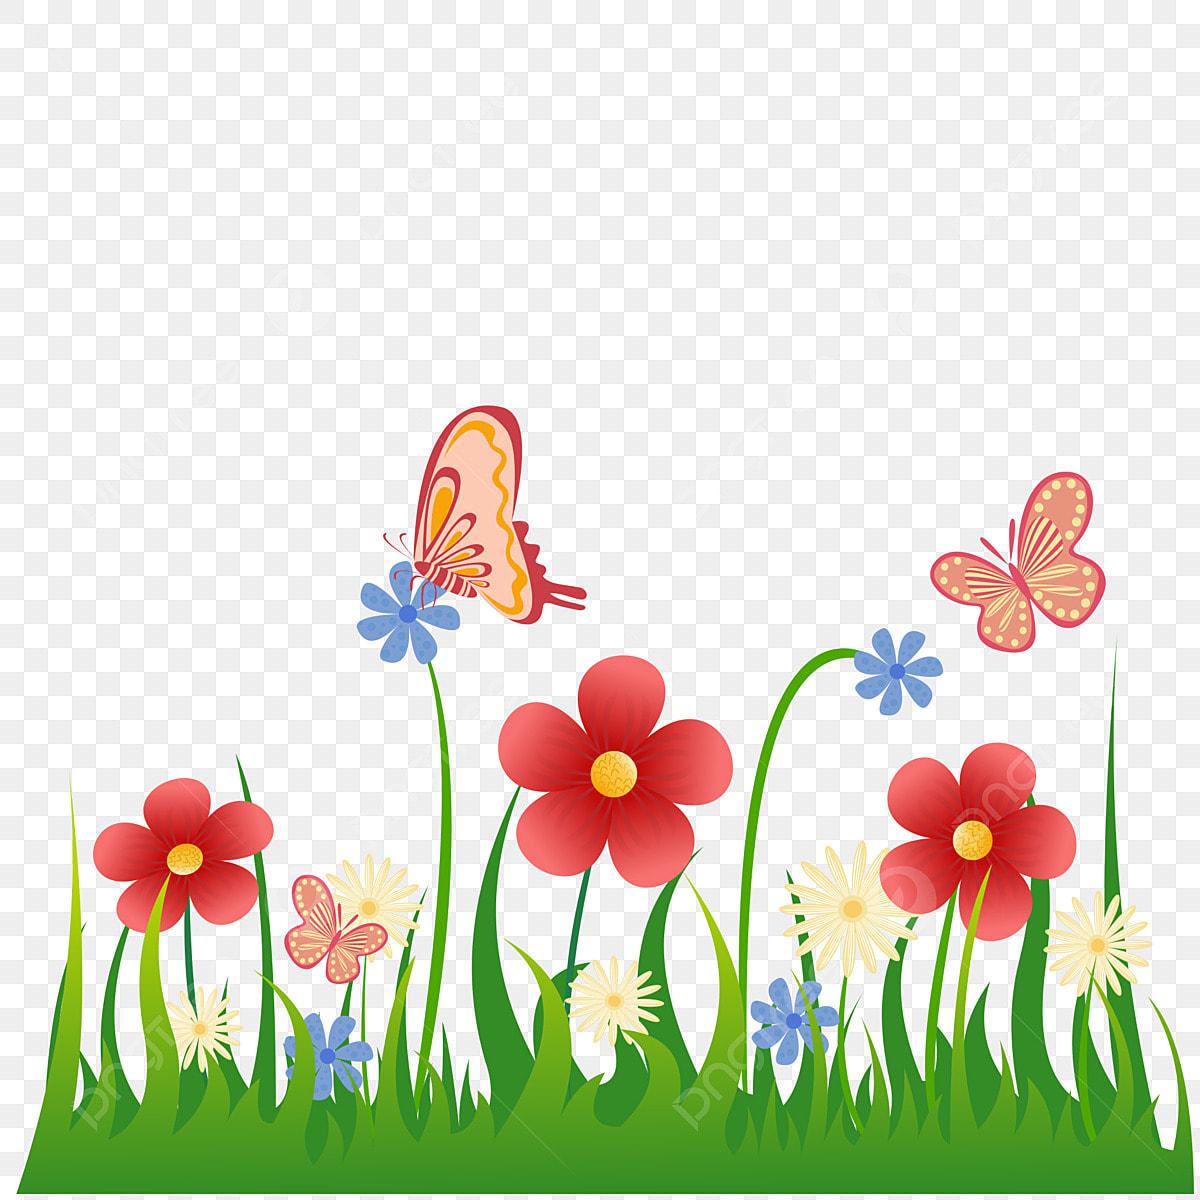 Kartun Padang Rumput Bunga Rama Rama Rama Rama Padang Rumput